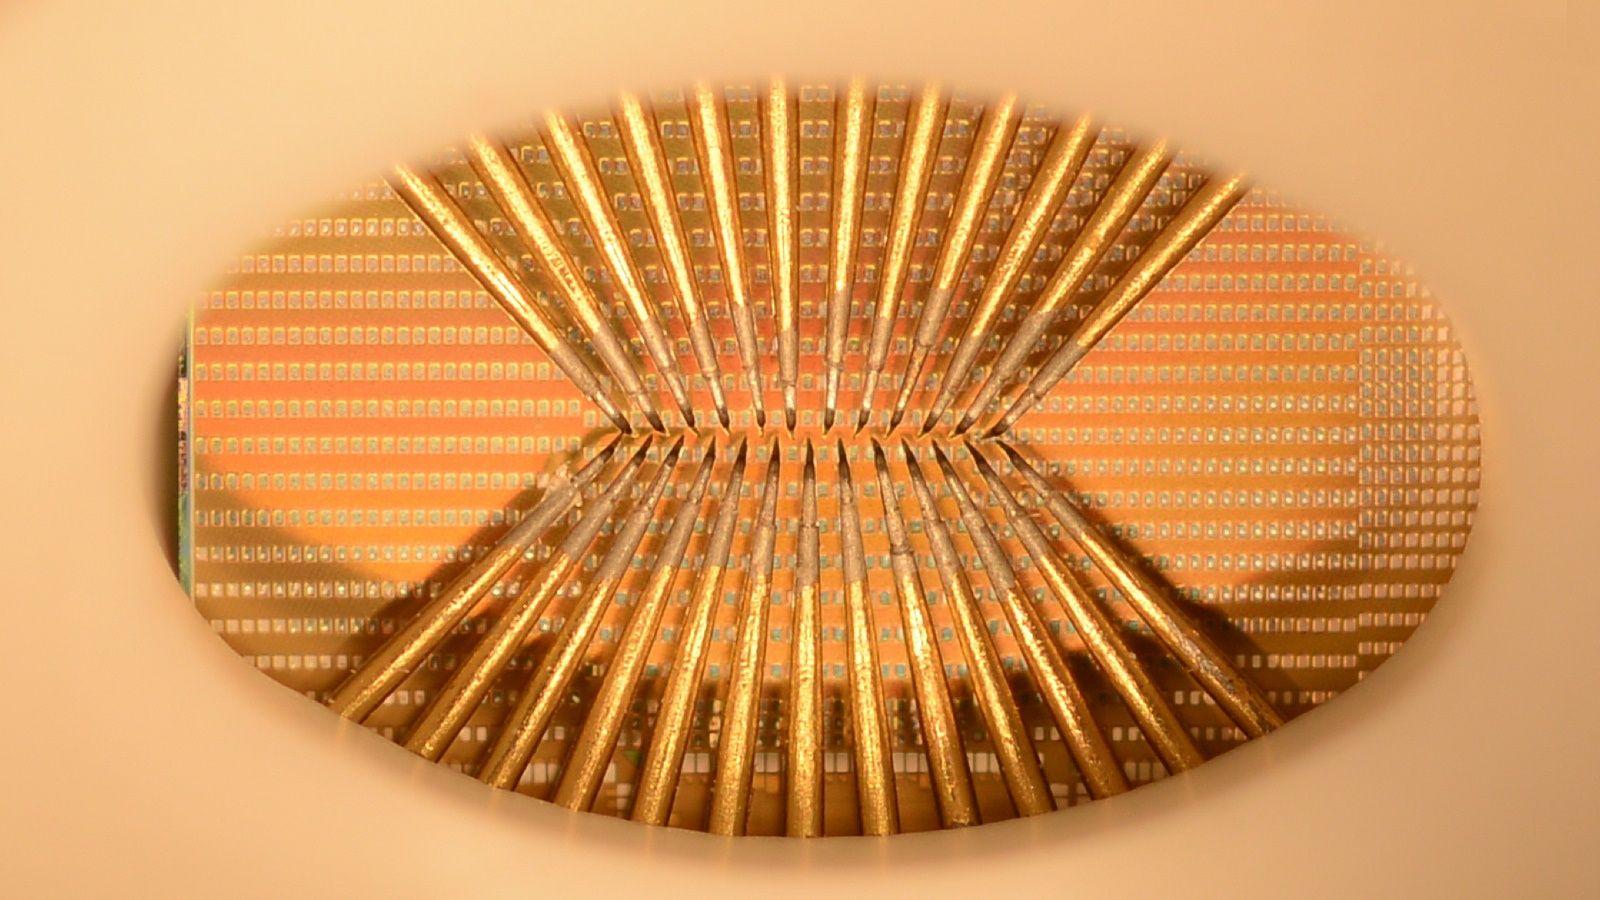 IBM artificial neuron AI computer